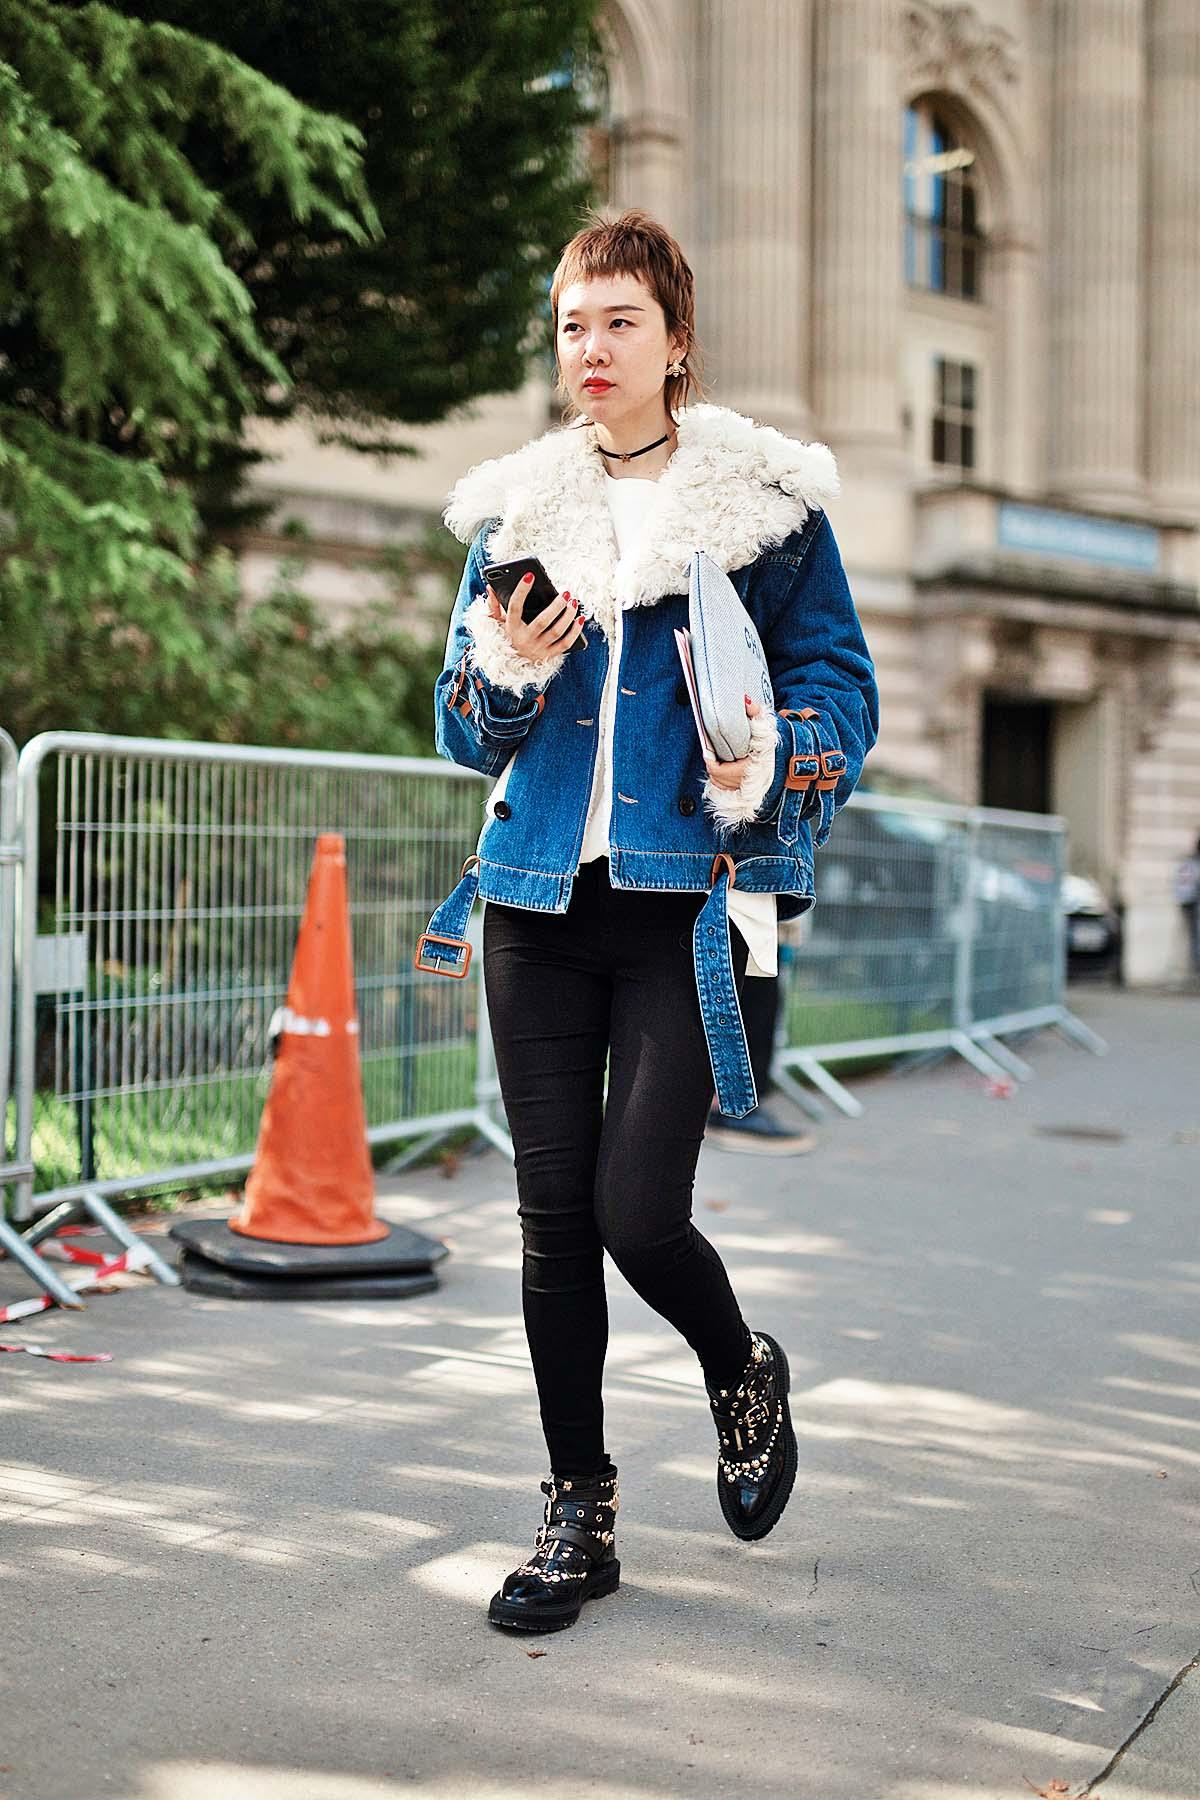 PARIS, FRANCE - OCTOBER 03:  A guest is seen attending Moncler Gamme Rouge during Paris Fashion Week wearing Moncler on October 3, 2017 in Paris, France.  (Photo by Matthew Sperzel/Getty Images)